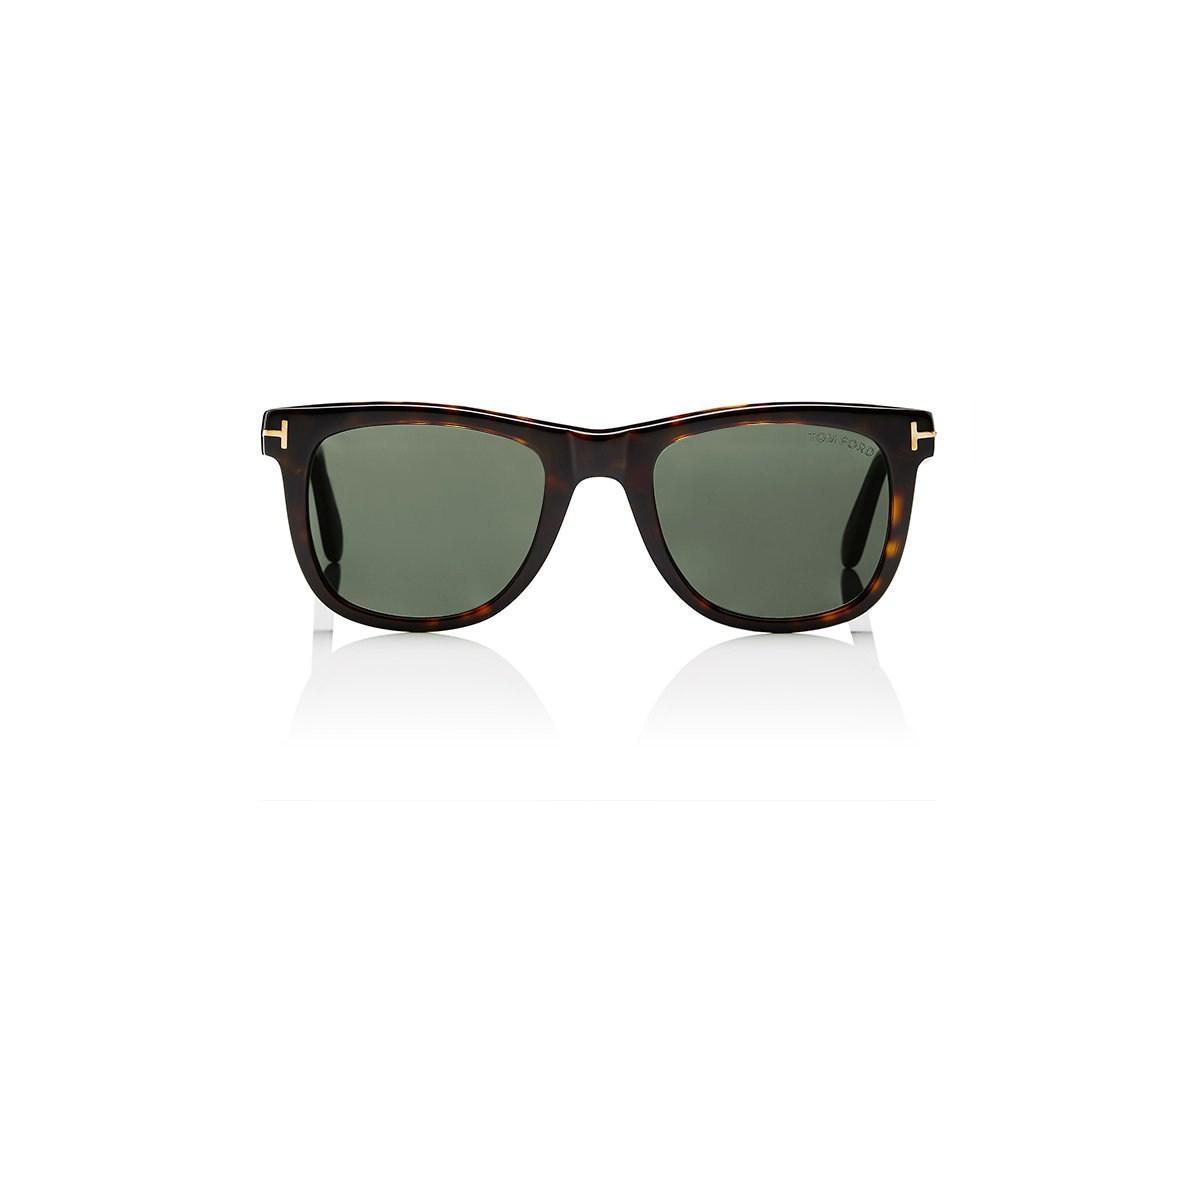 6c554e2a7339 Tom Ford. Men s Gray Leo Sunglasses.  395 From Barneys New York ...